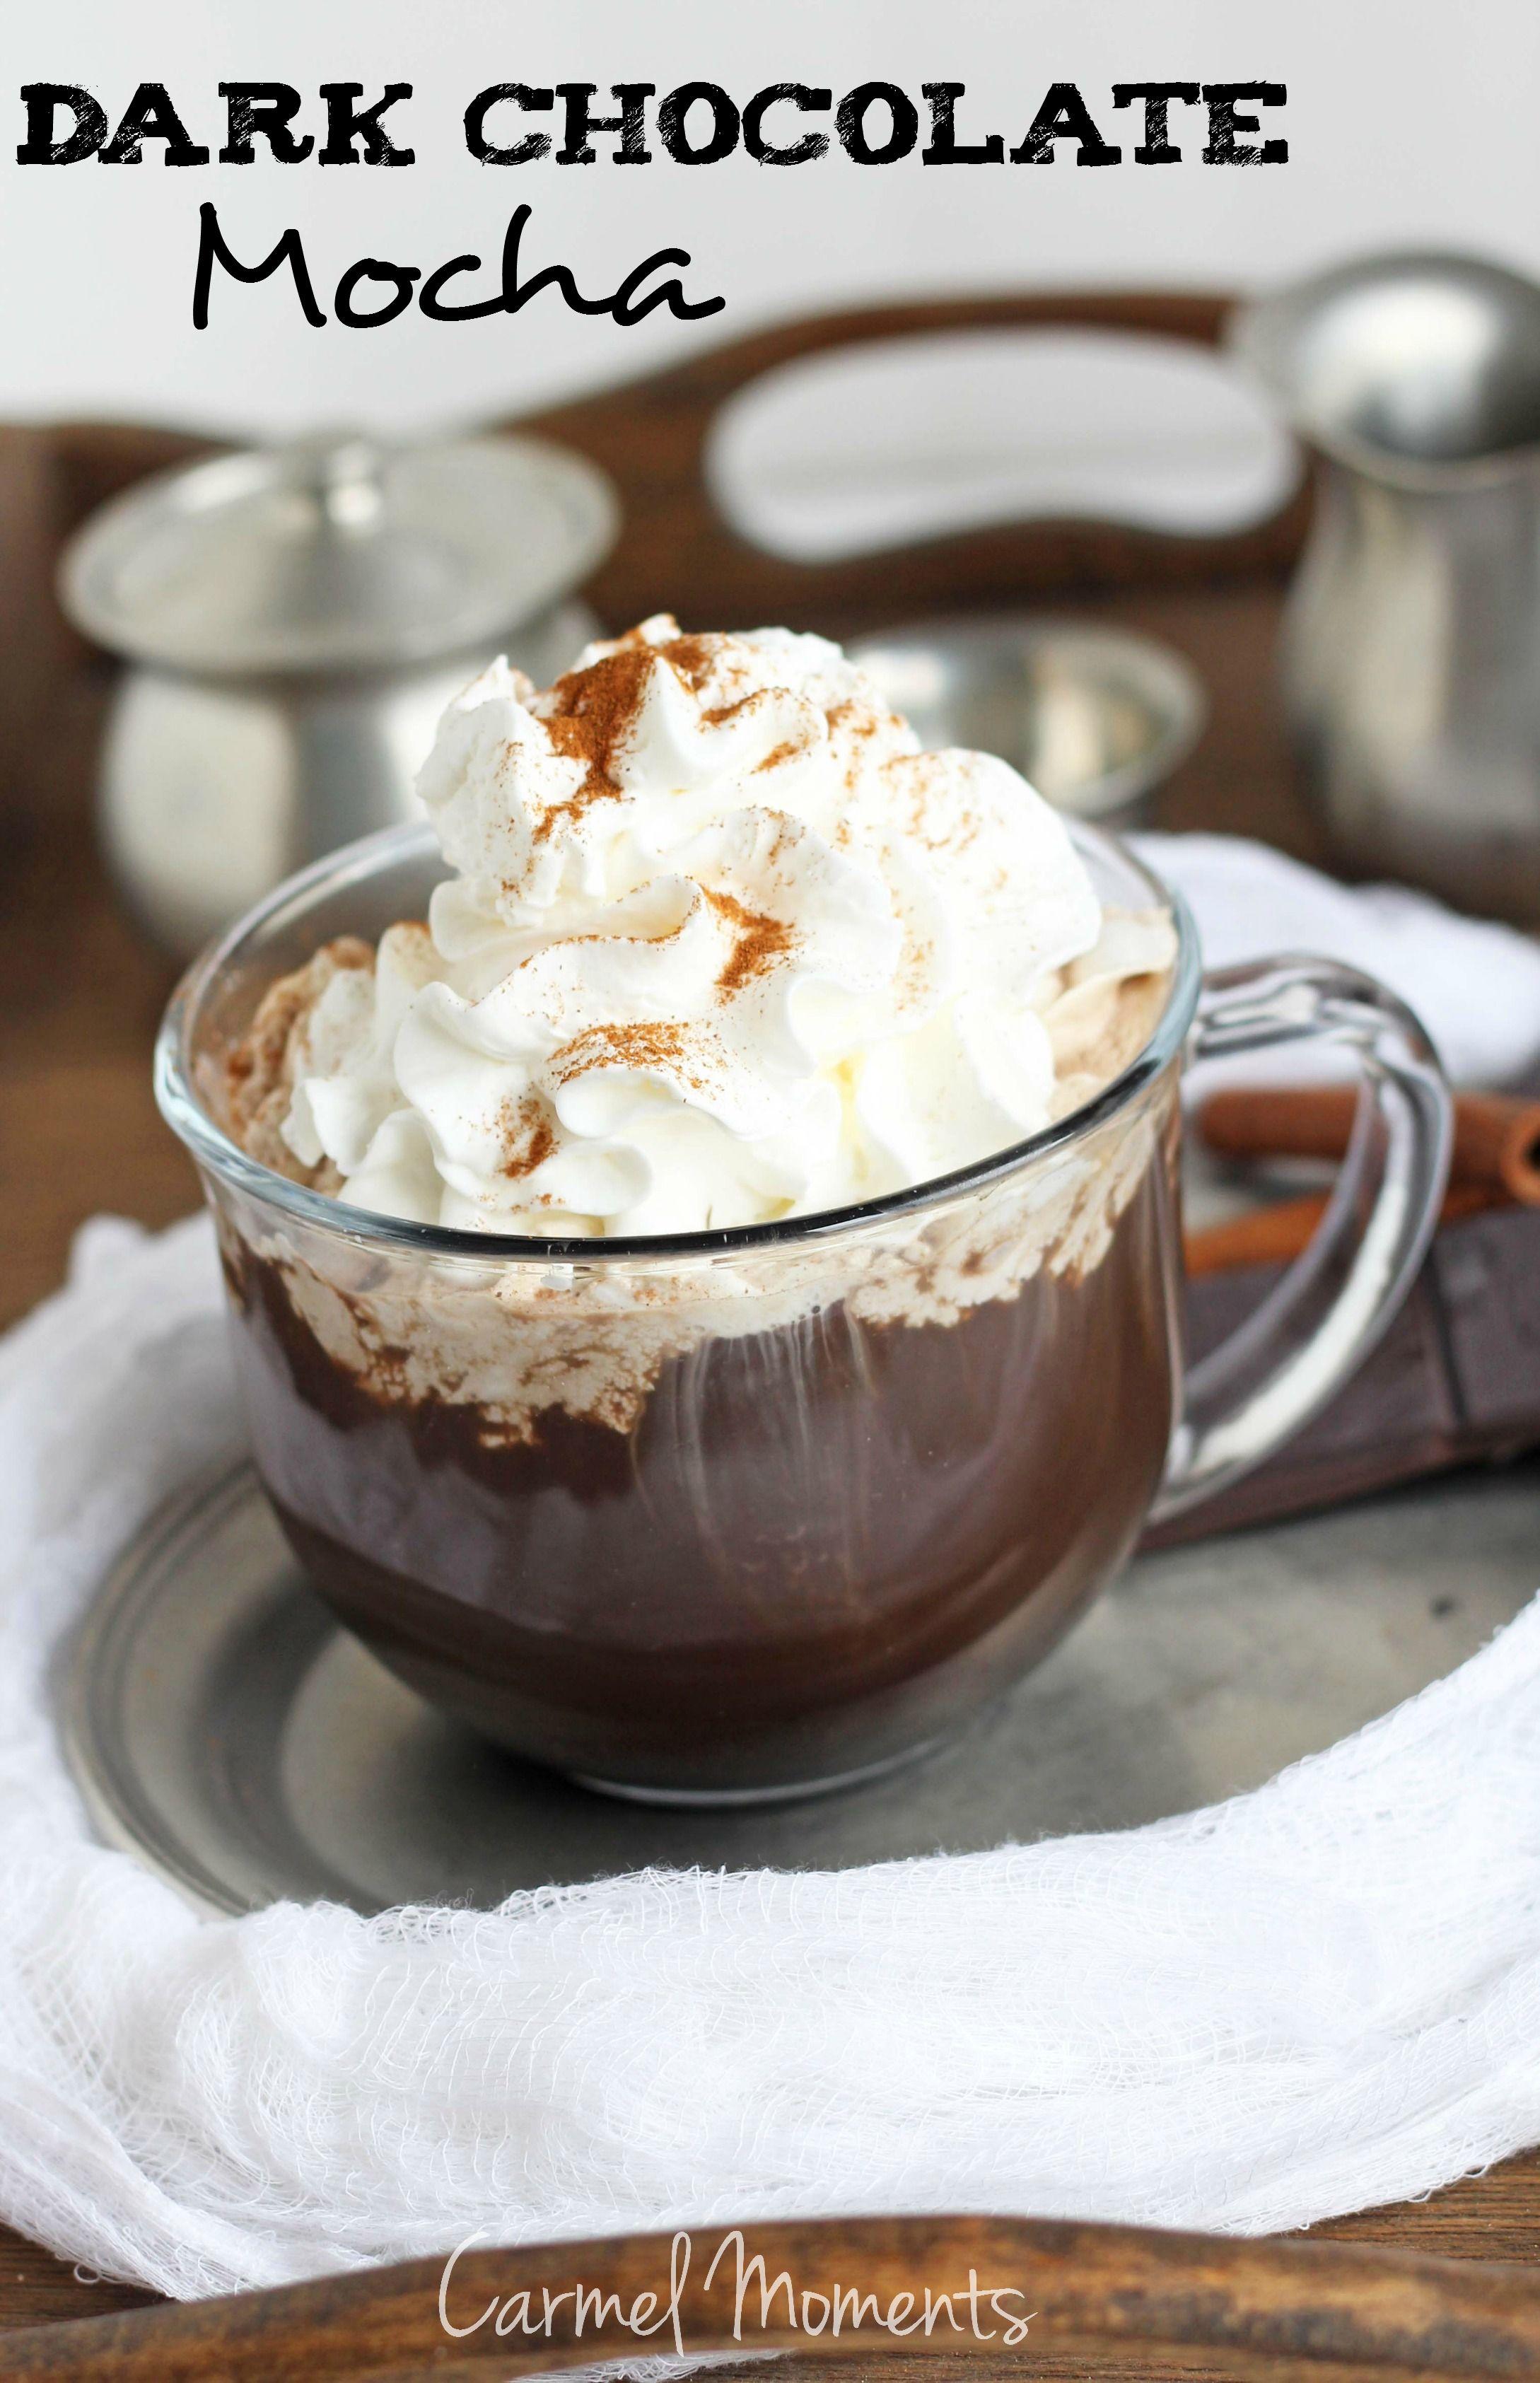 DIY Dark Chocolate Mocha -- Delicious dark chocolate mocha with an easy to make recipe.   carmelmoments.com